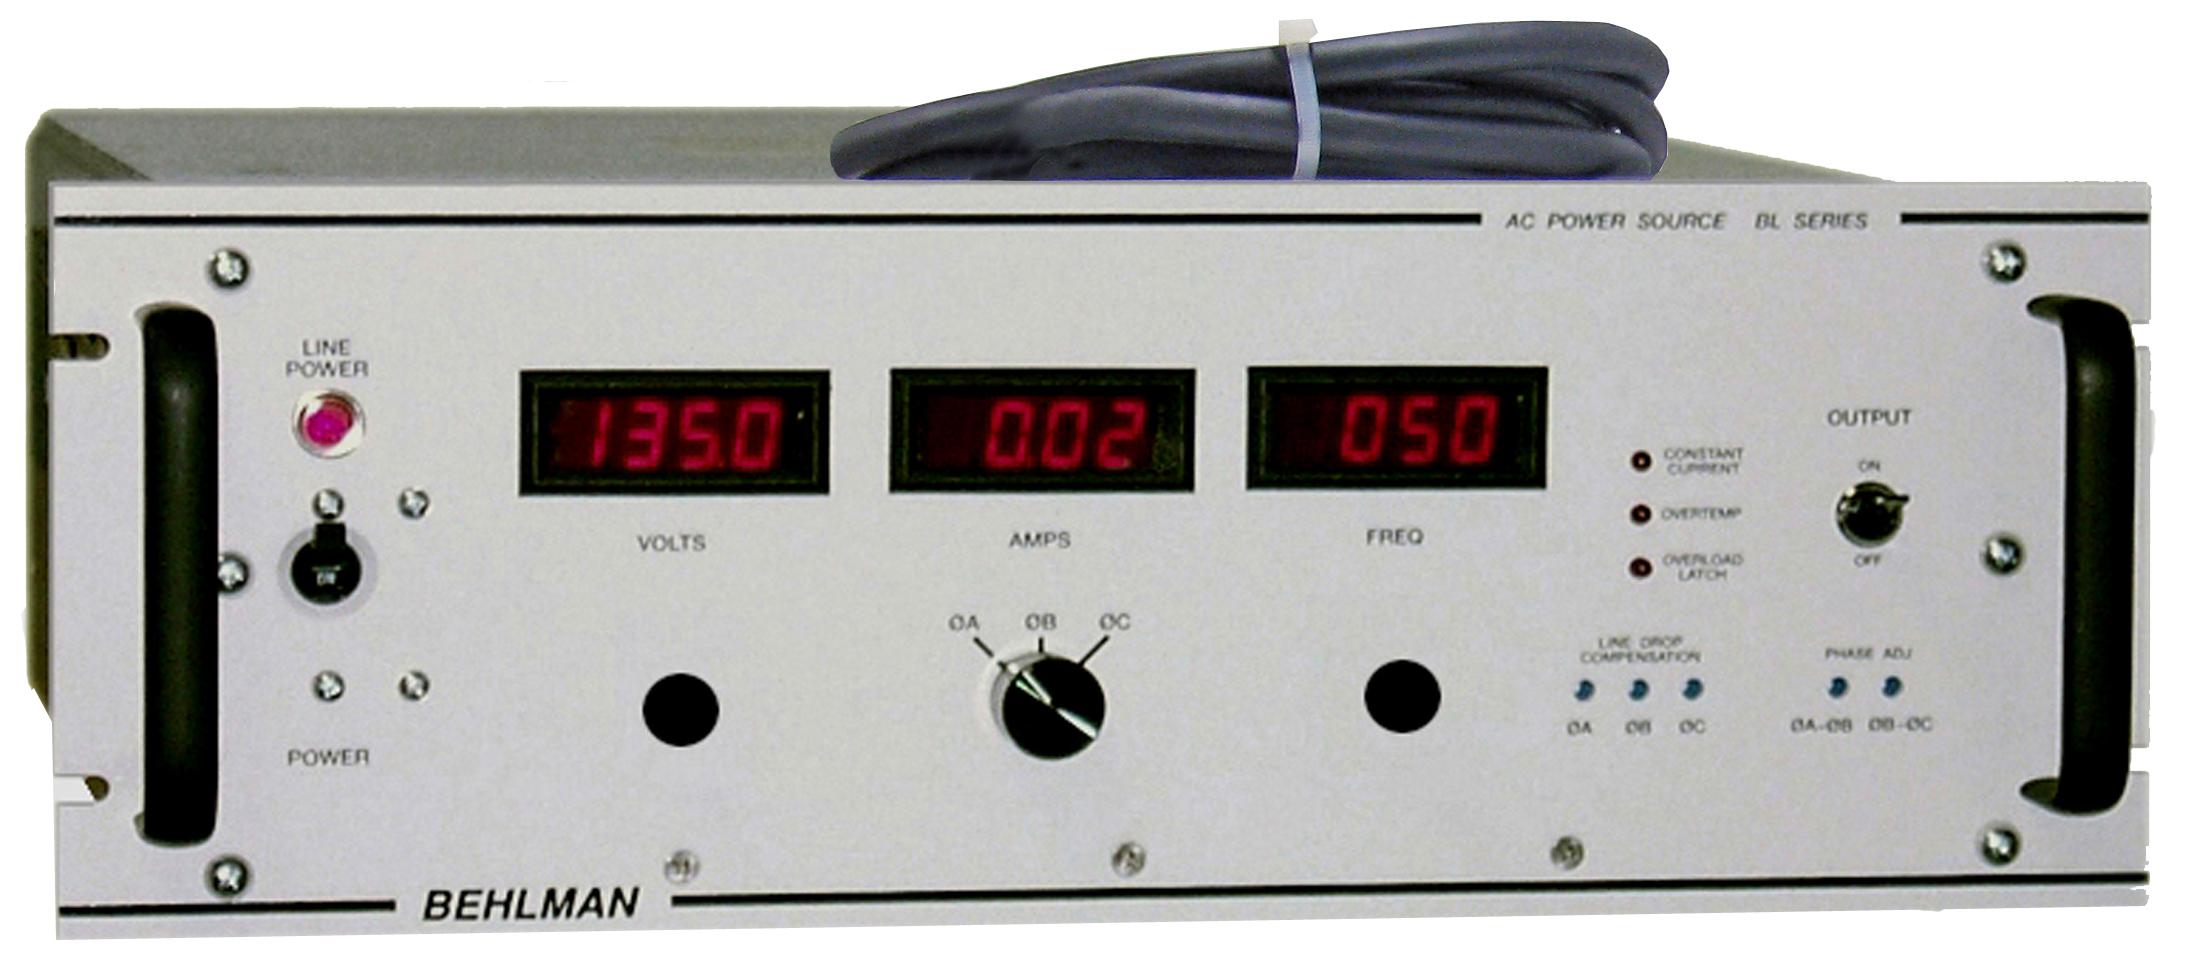 Behlman Announces Availability Of Turn Key Ac Frequency